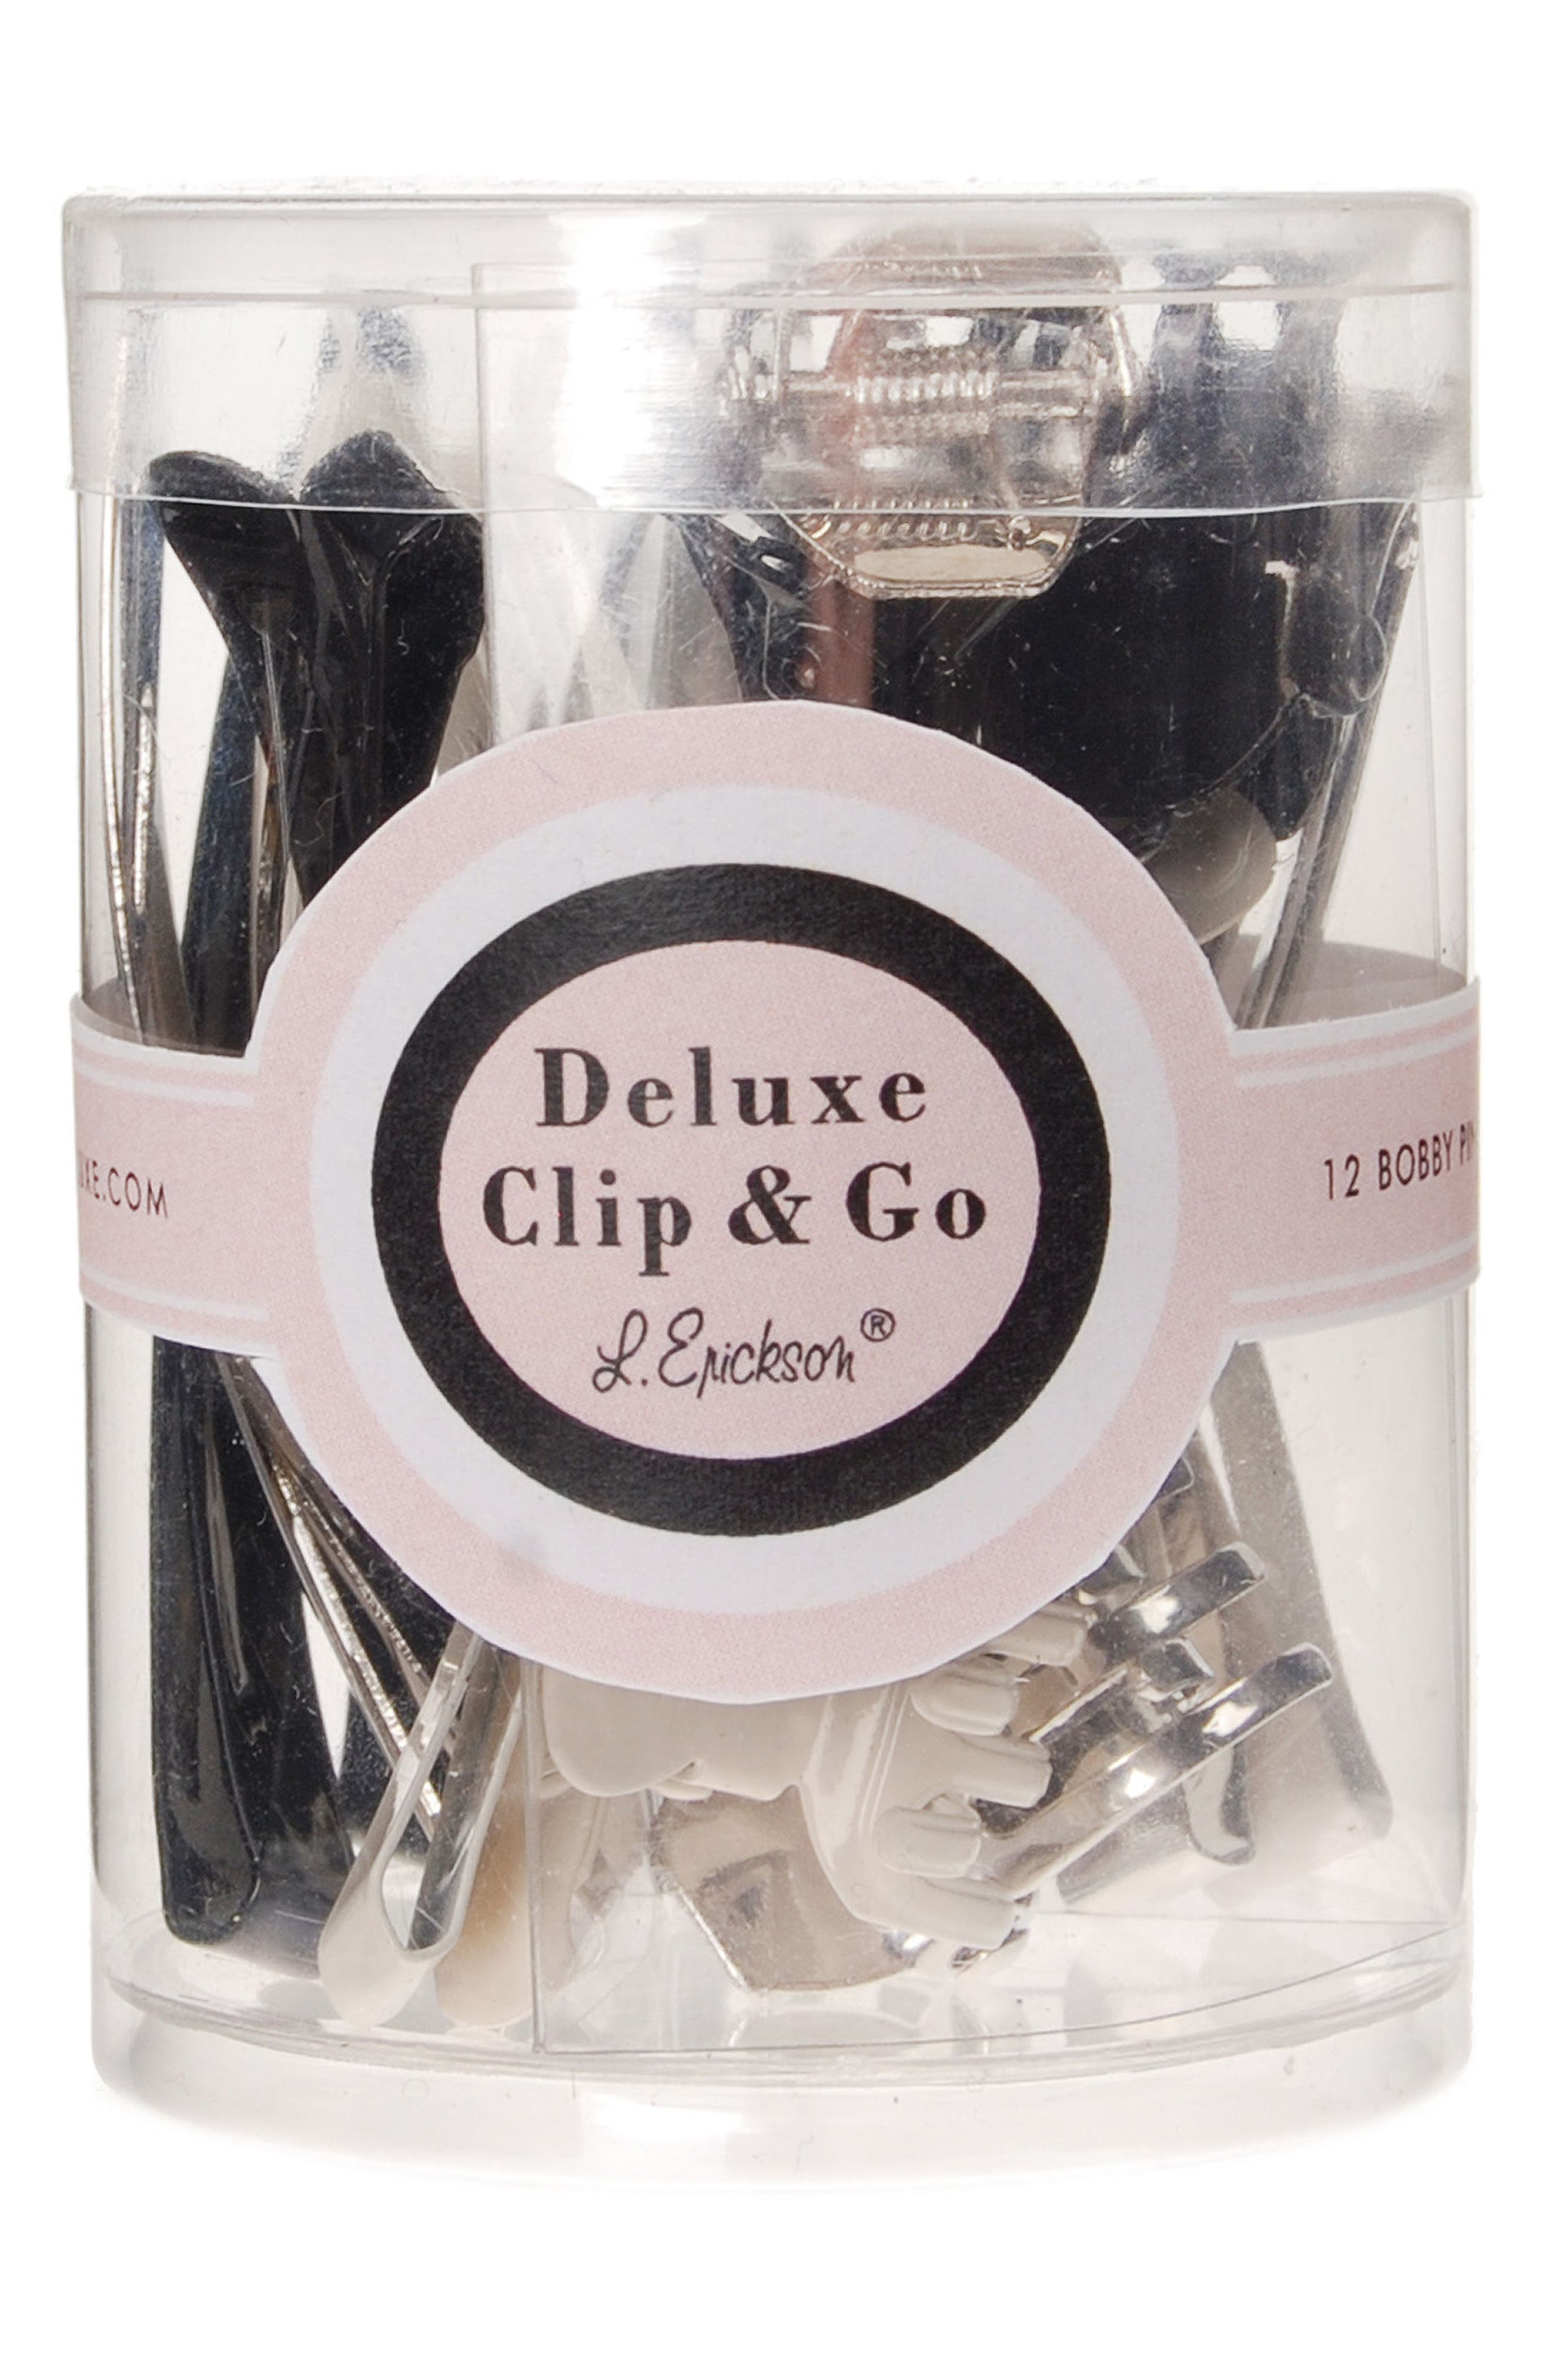 Deluxe Clip & Go Kit,                         Main,                         color, SILVER/ GUNMETAL/ BLACK/ IVORY